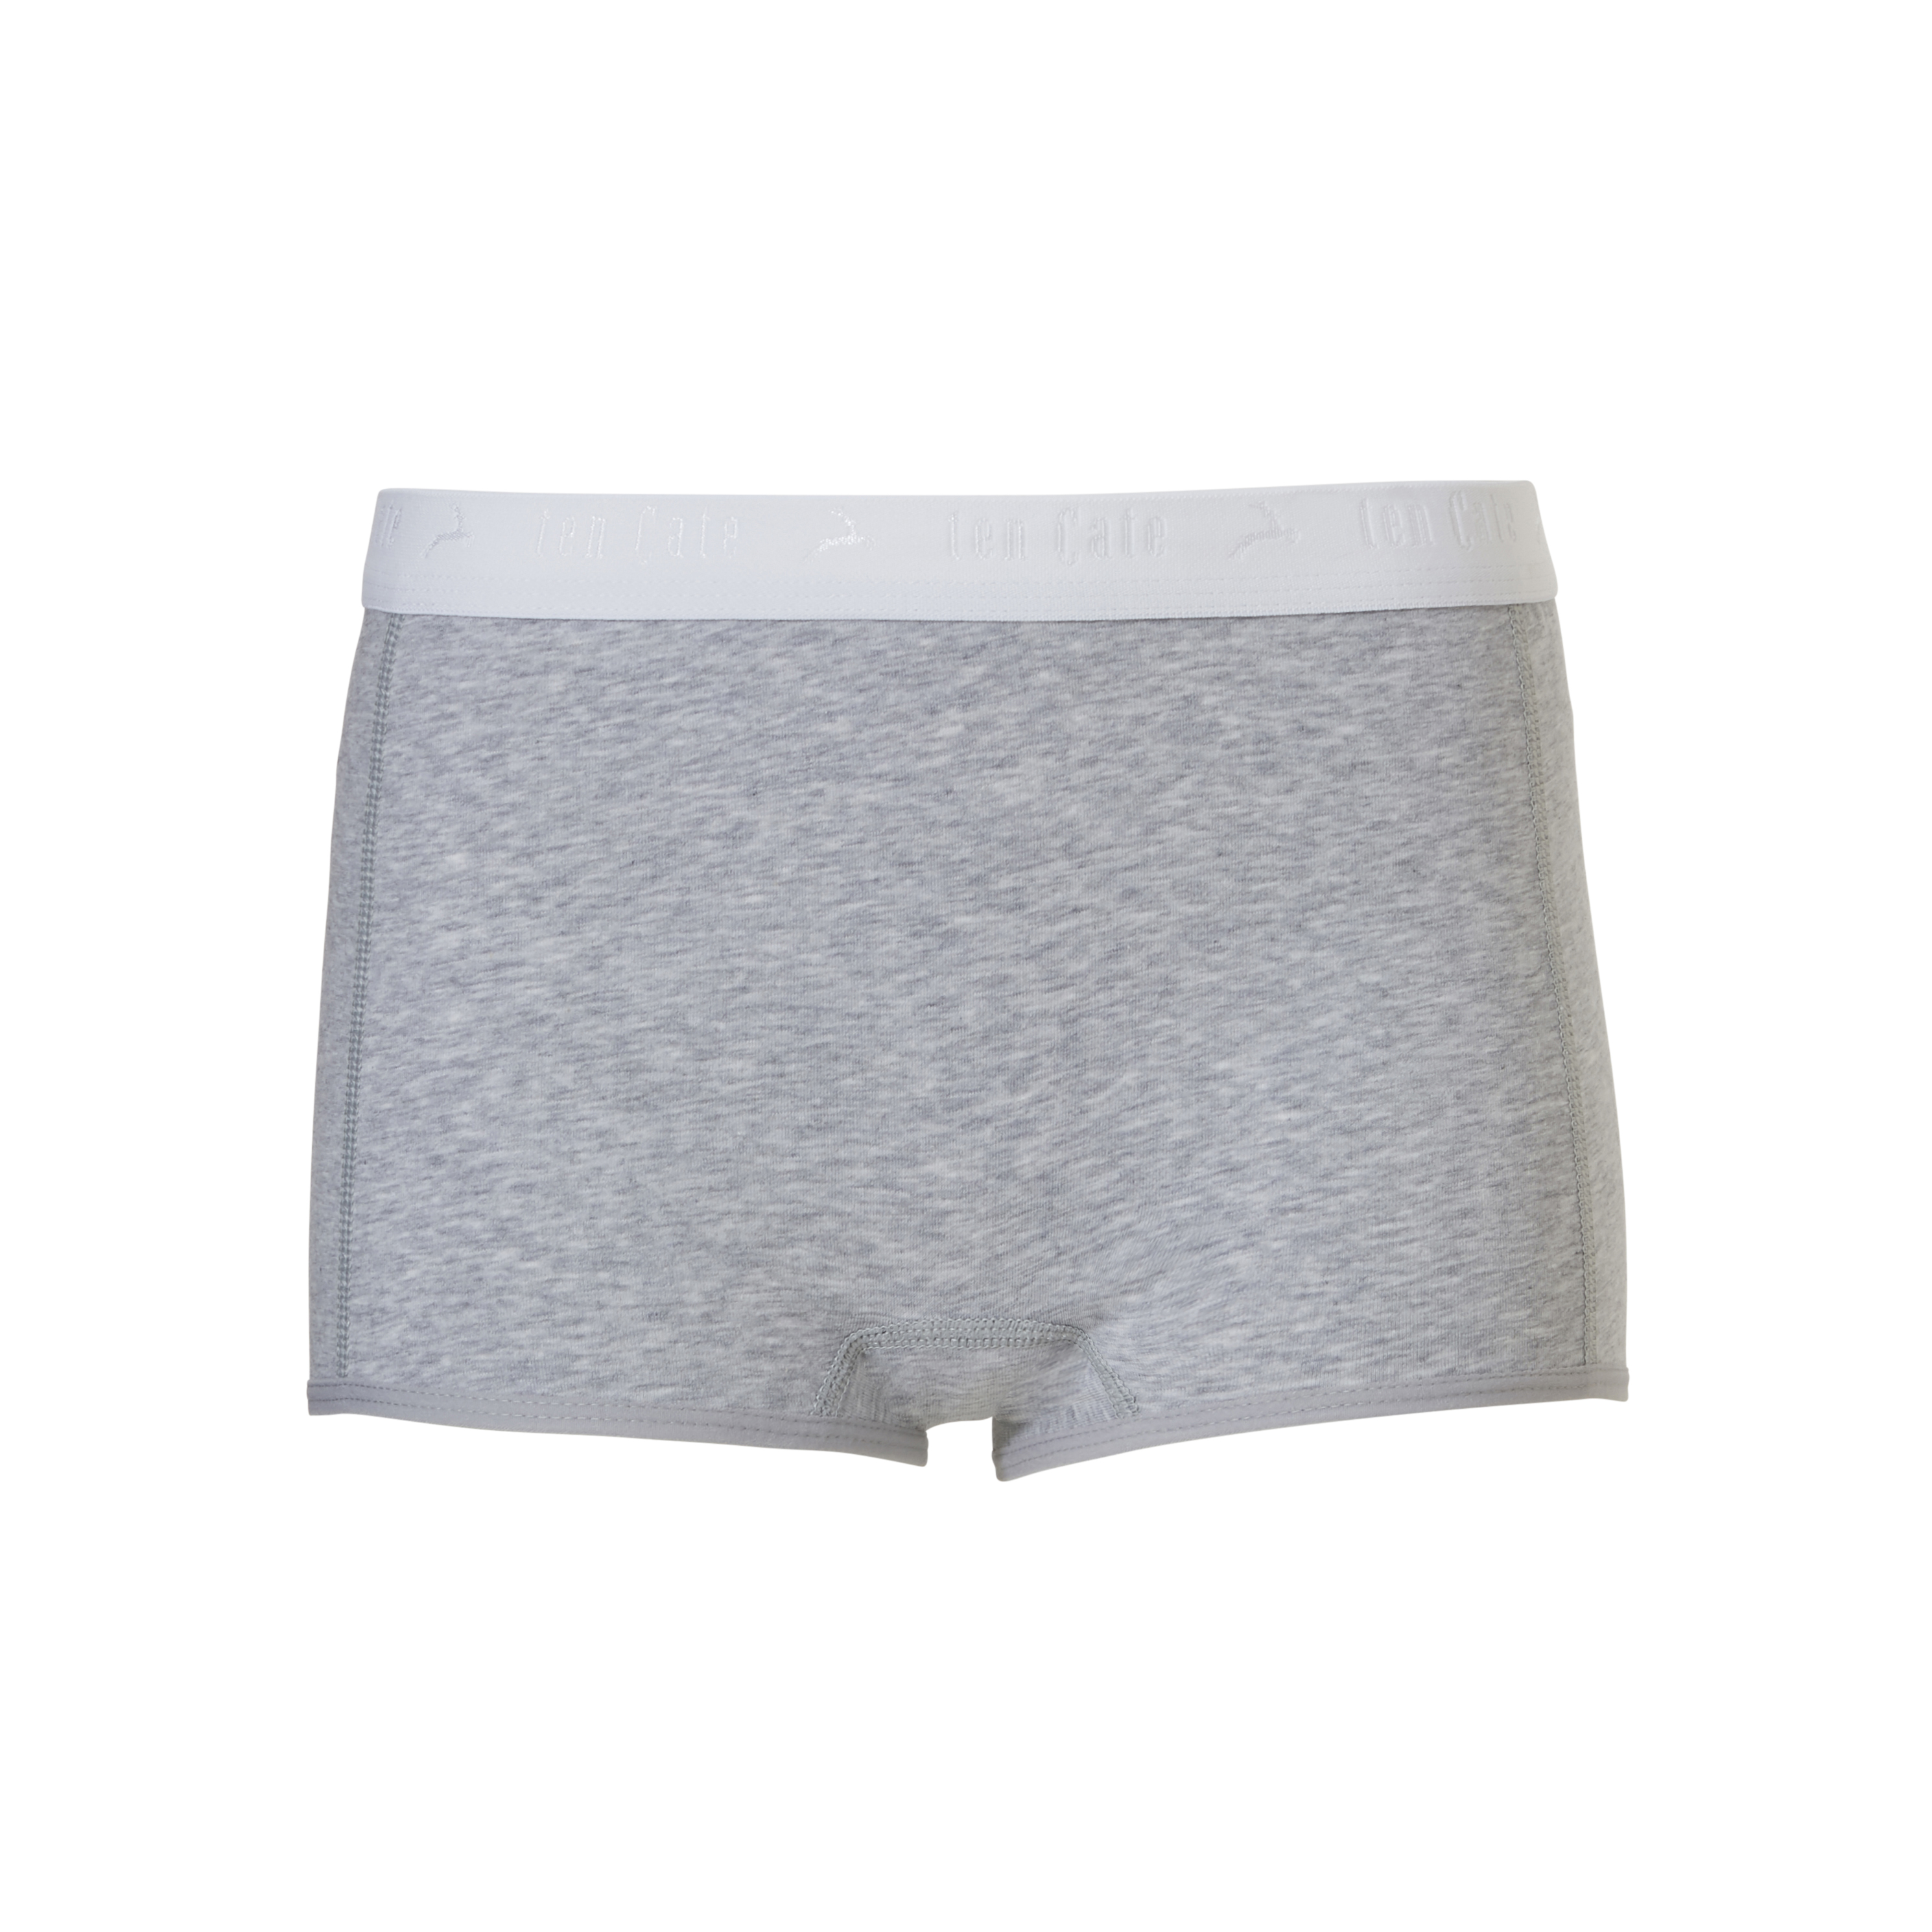 Ten Cate Kids Girls Shorts grey melee 2-pack